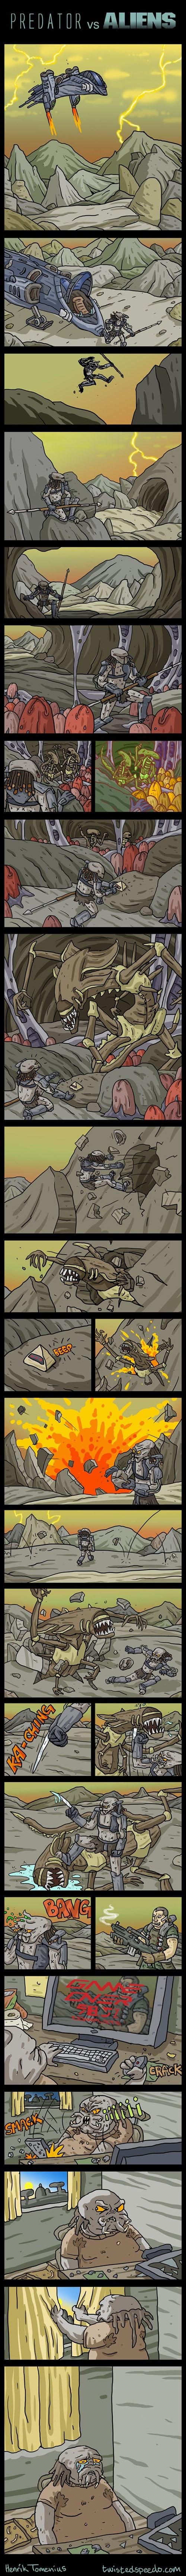 aliens vs predator vs humanos